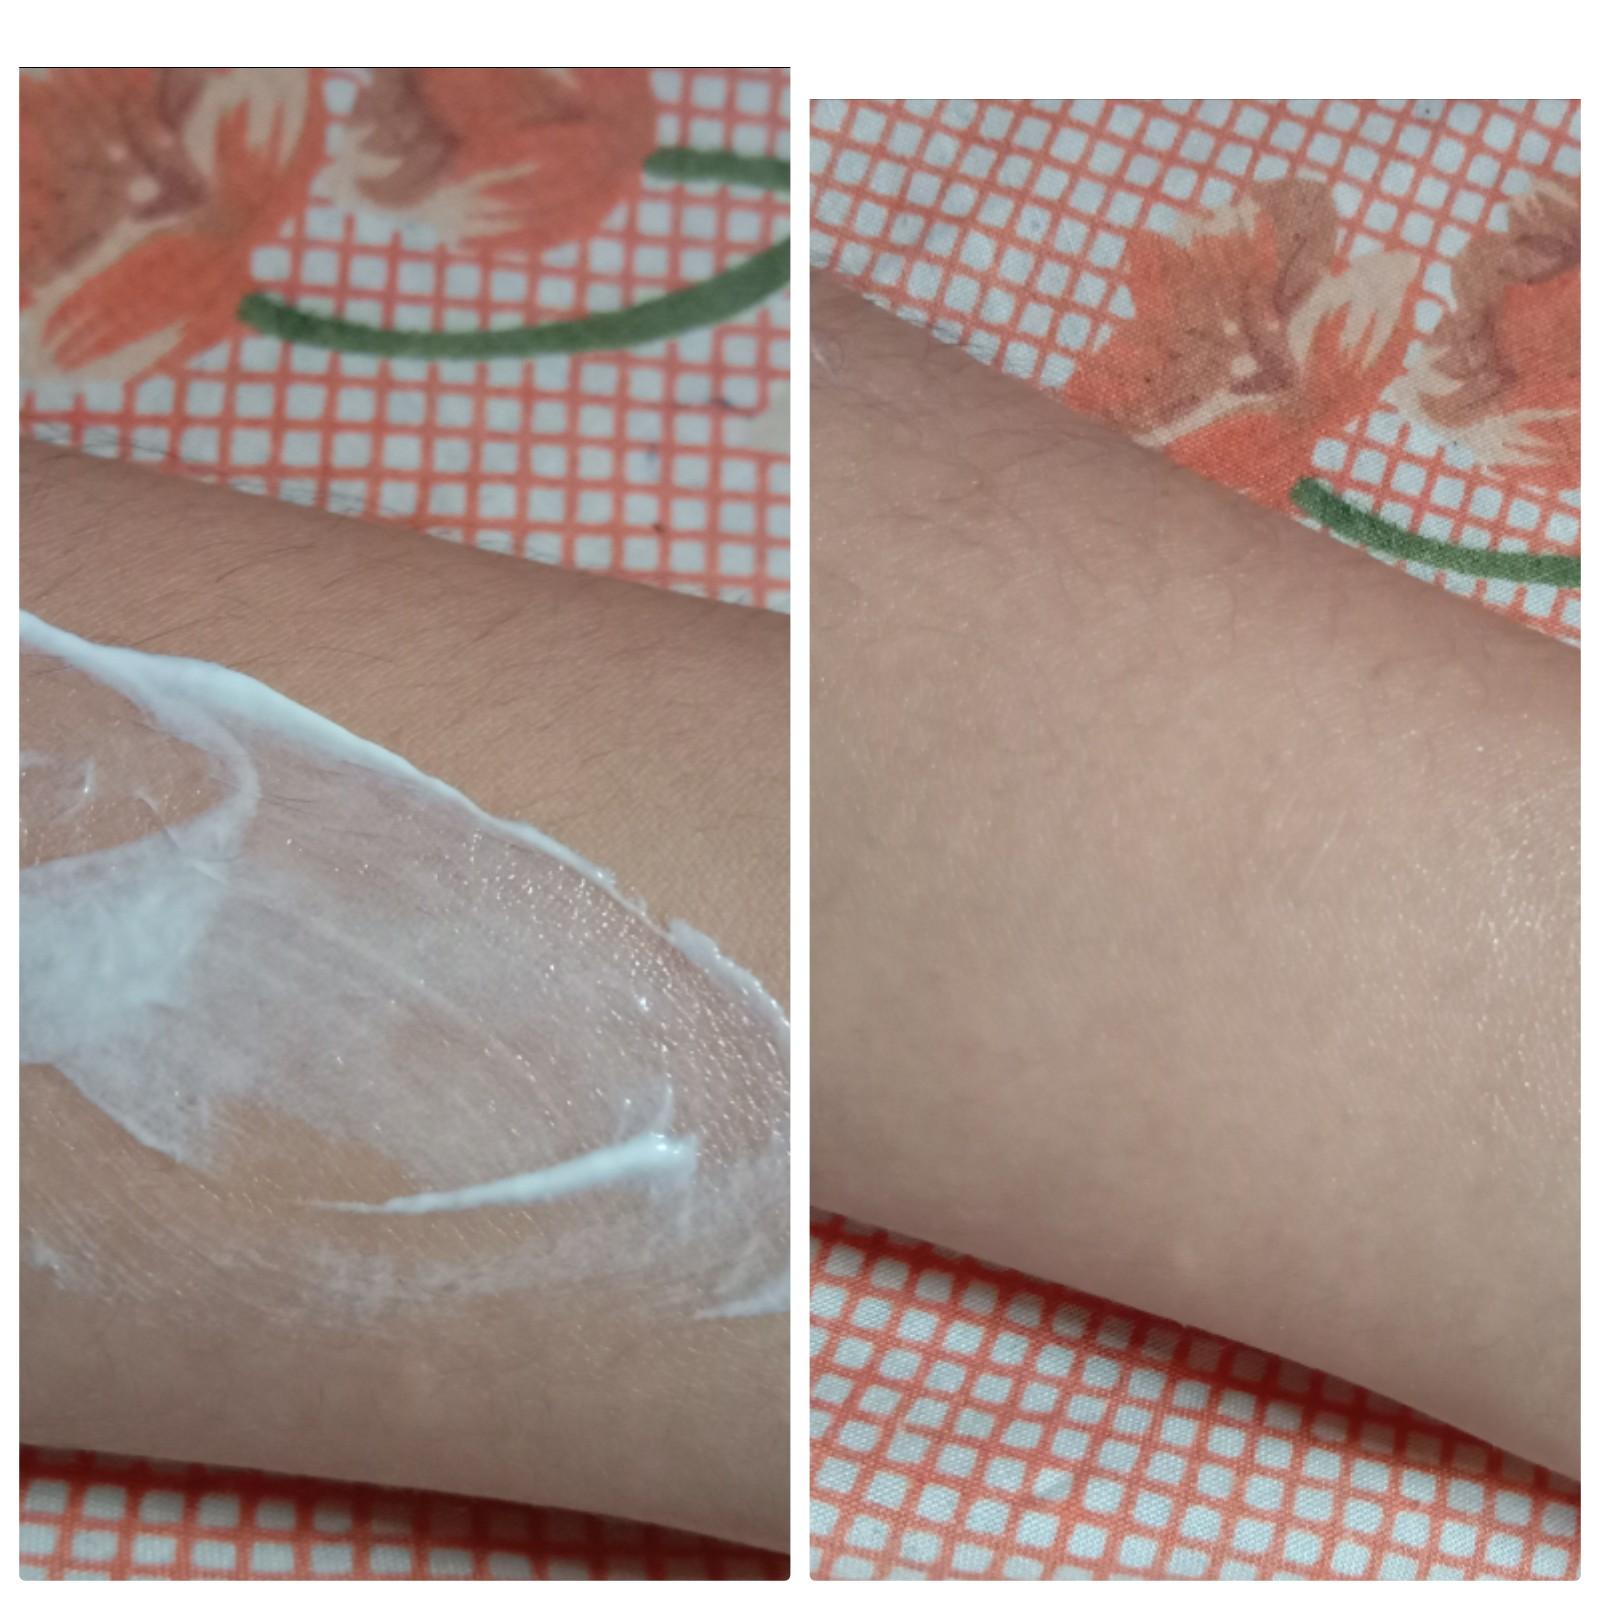 Lakme Sun Expert SPF 24 PA++ UV Lotion-Lakme Sunexpert honest review-By oshy-5